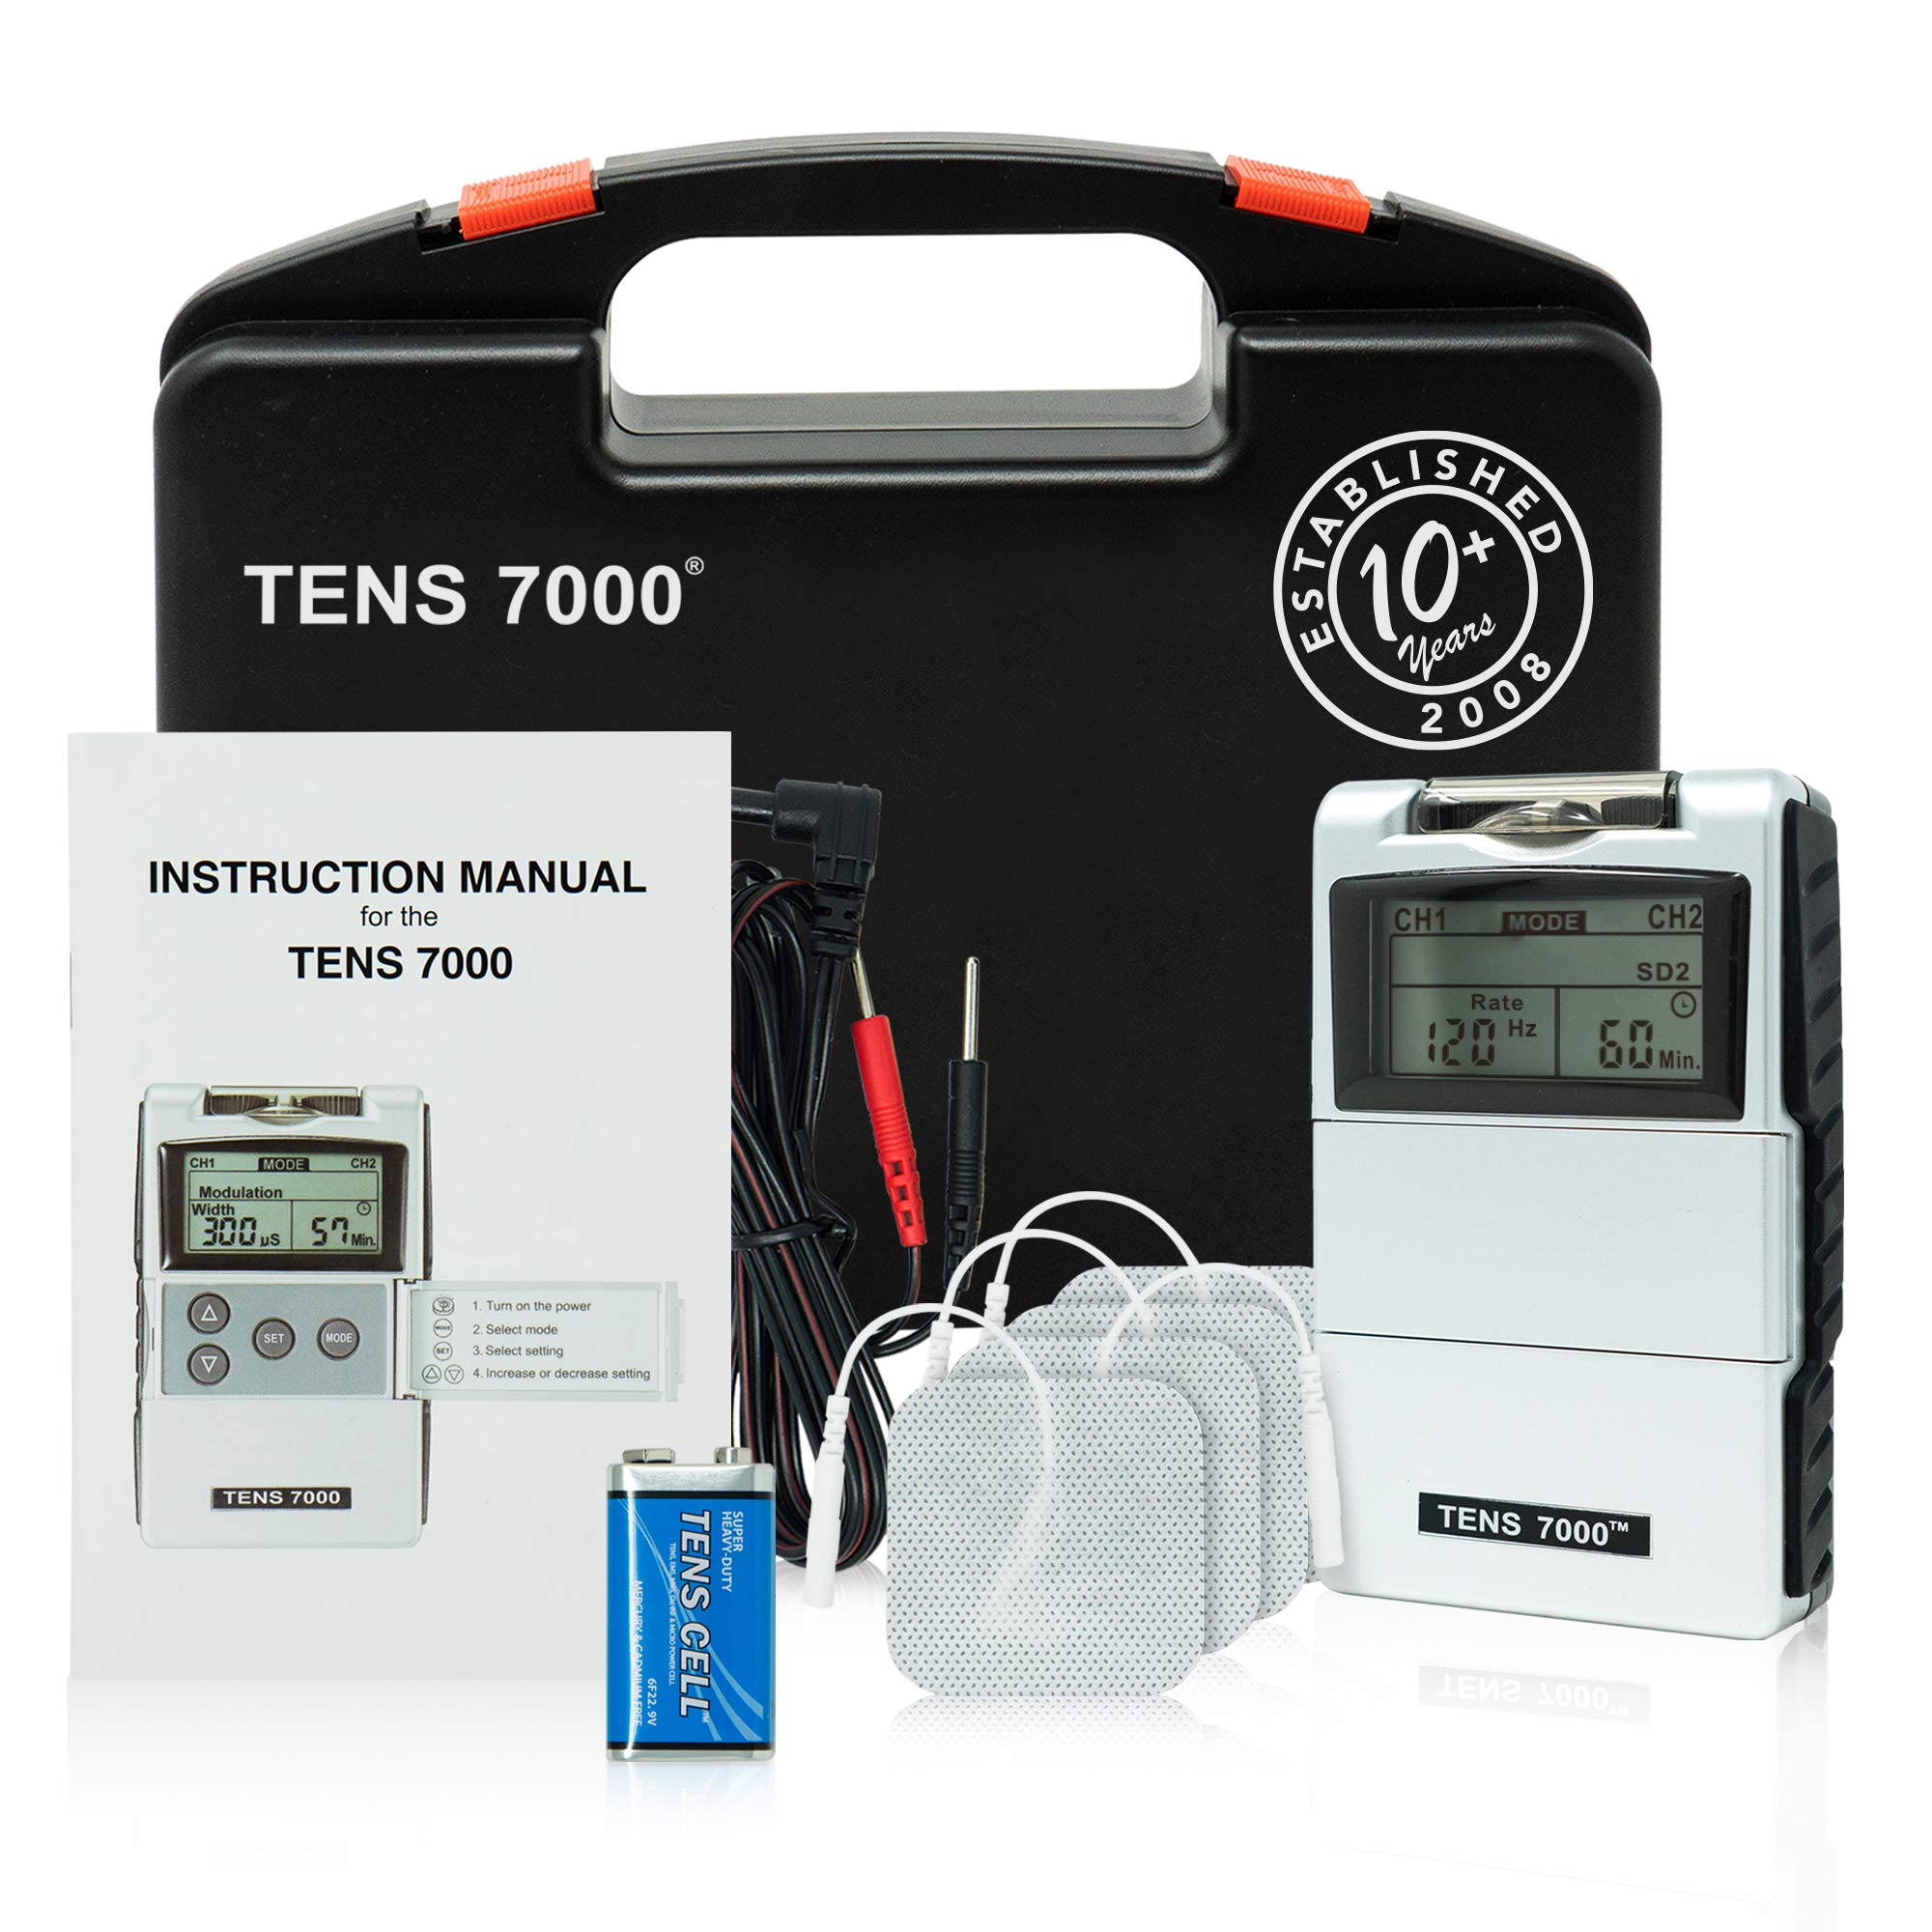 TENS 7000 Digital Unit Accessories